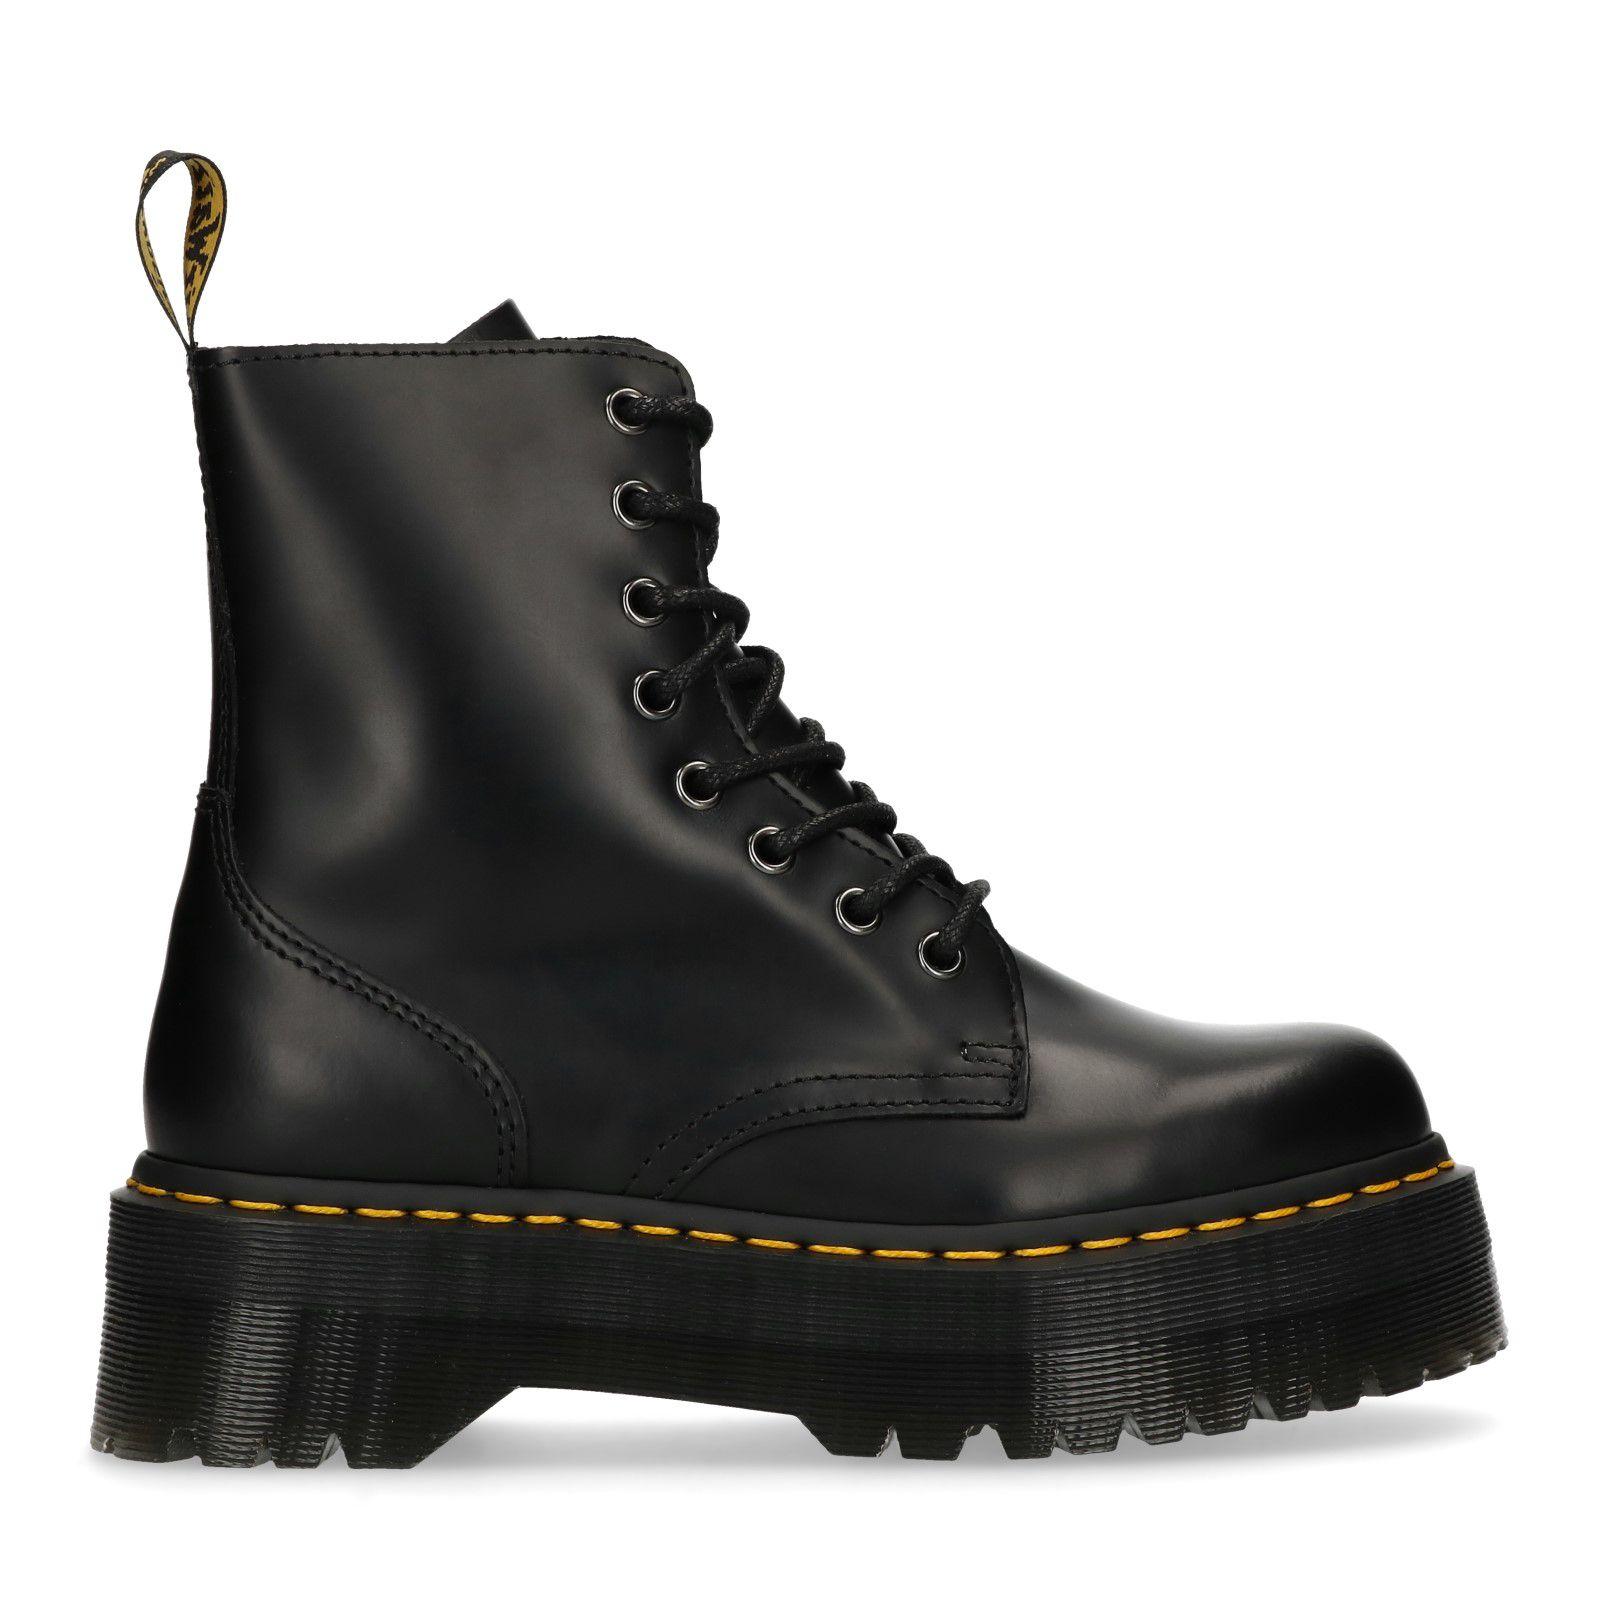 wholesale dealer 829ba d4566 dr-martens-biker-boots-leer-schwarz-4.7492 1.jpg